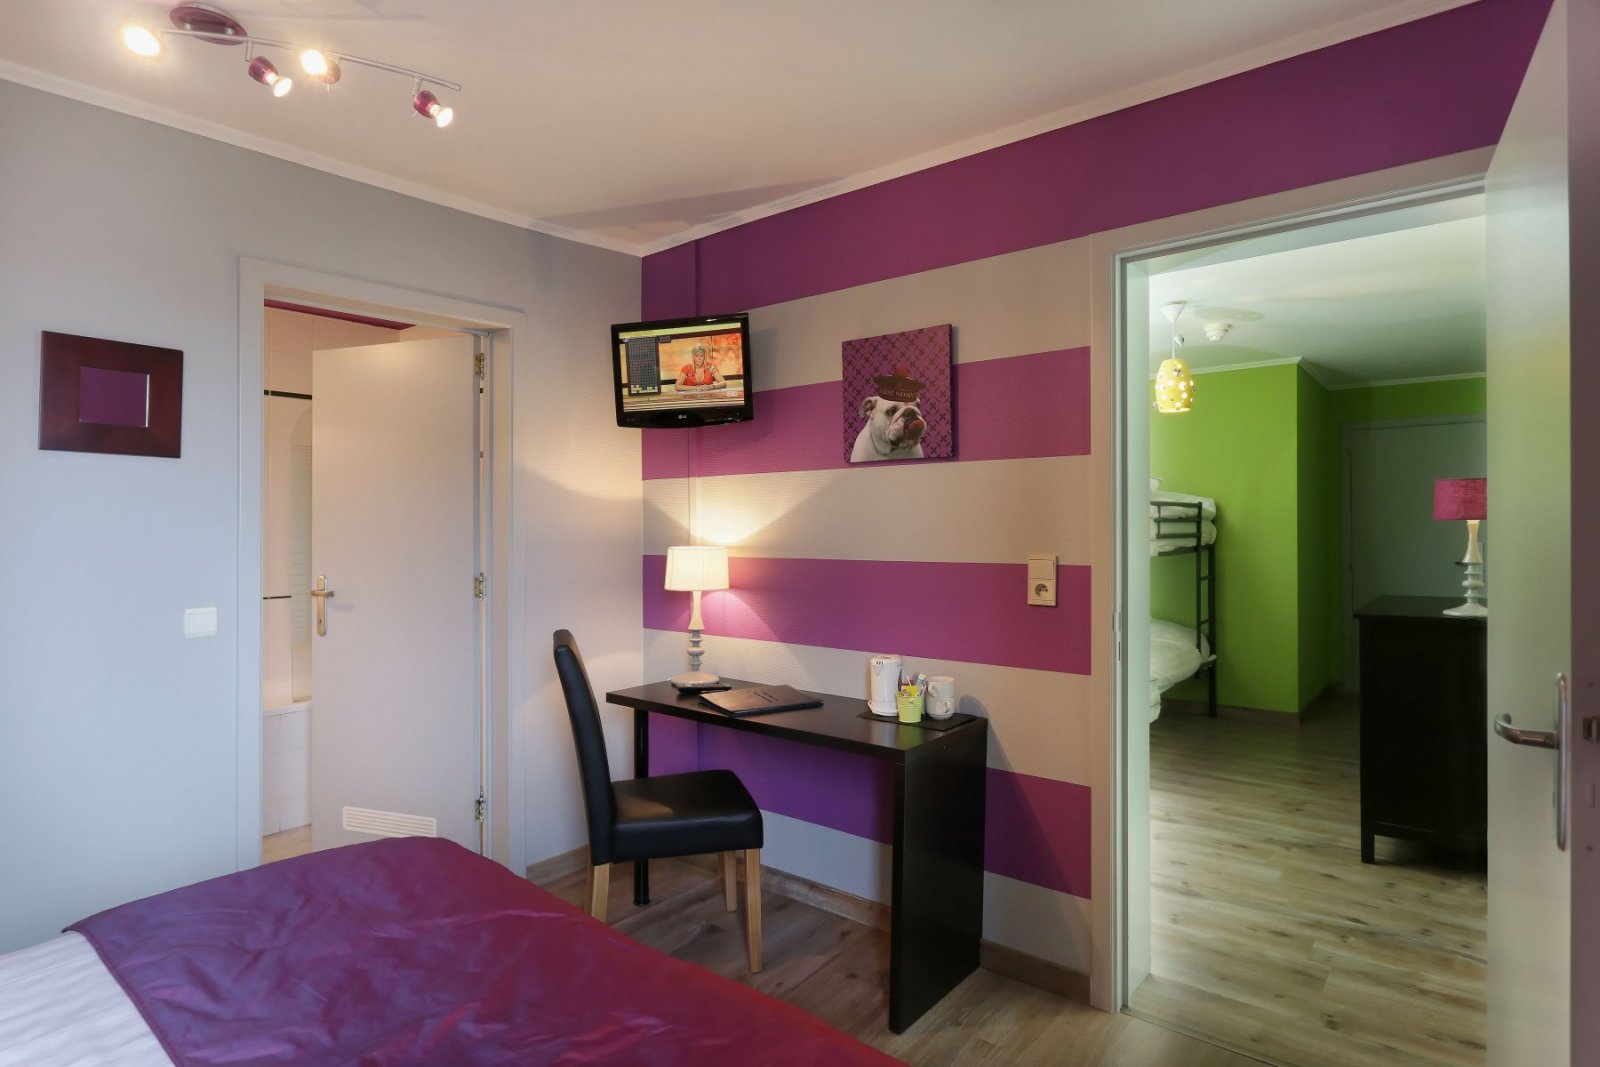 les chambres h tel myrtilles. Black Bedroom Furniture Sets. Home Design Ideas